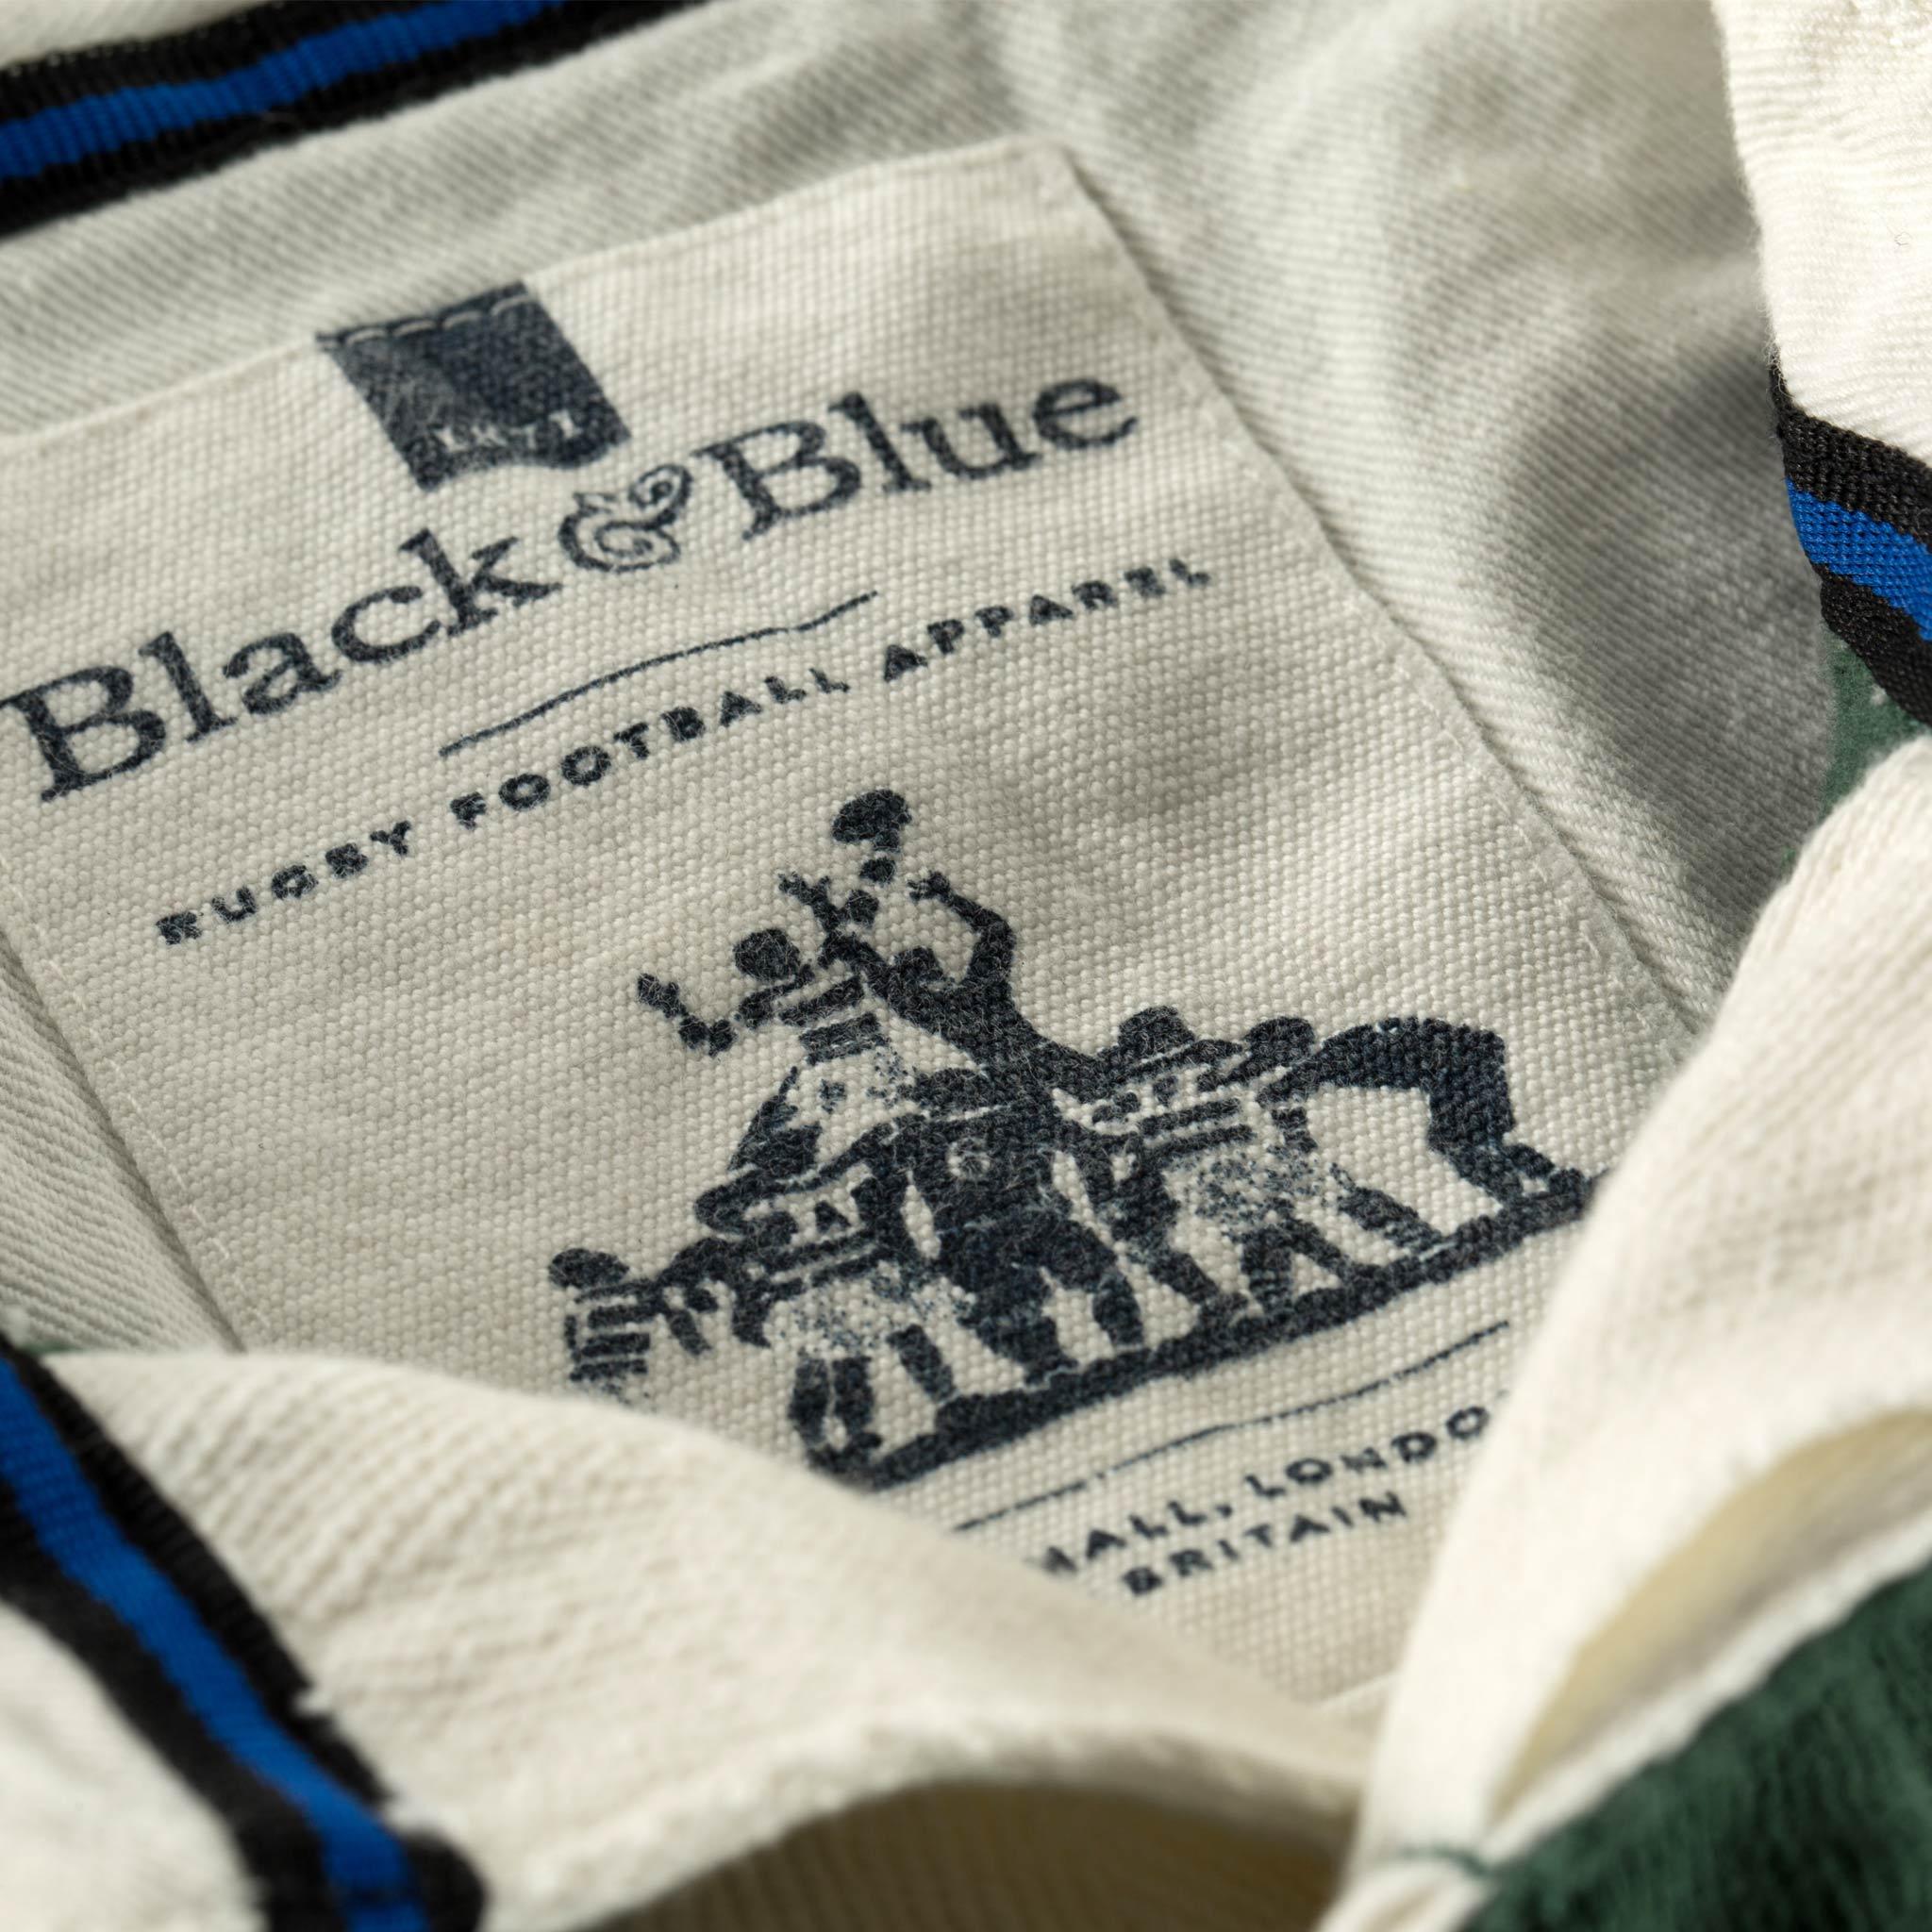 West Kent 1871 Rugby Shirt neck label